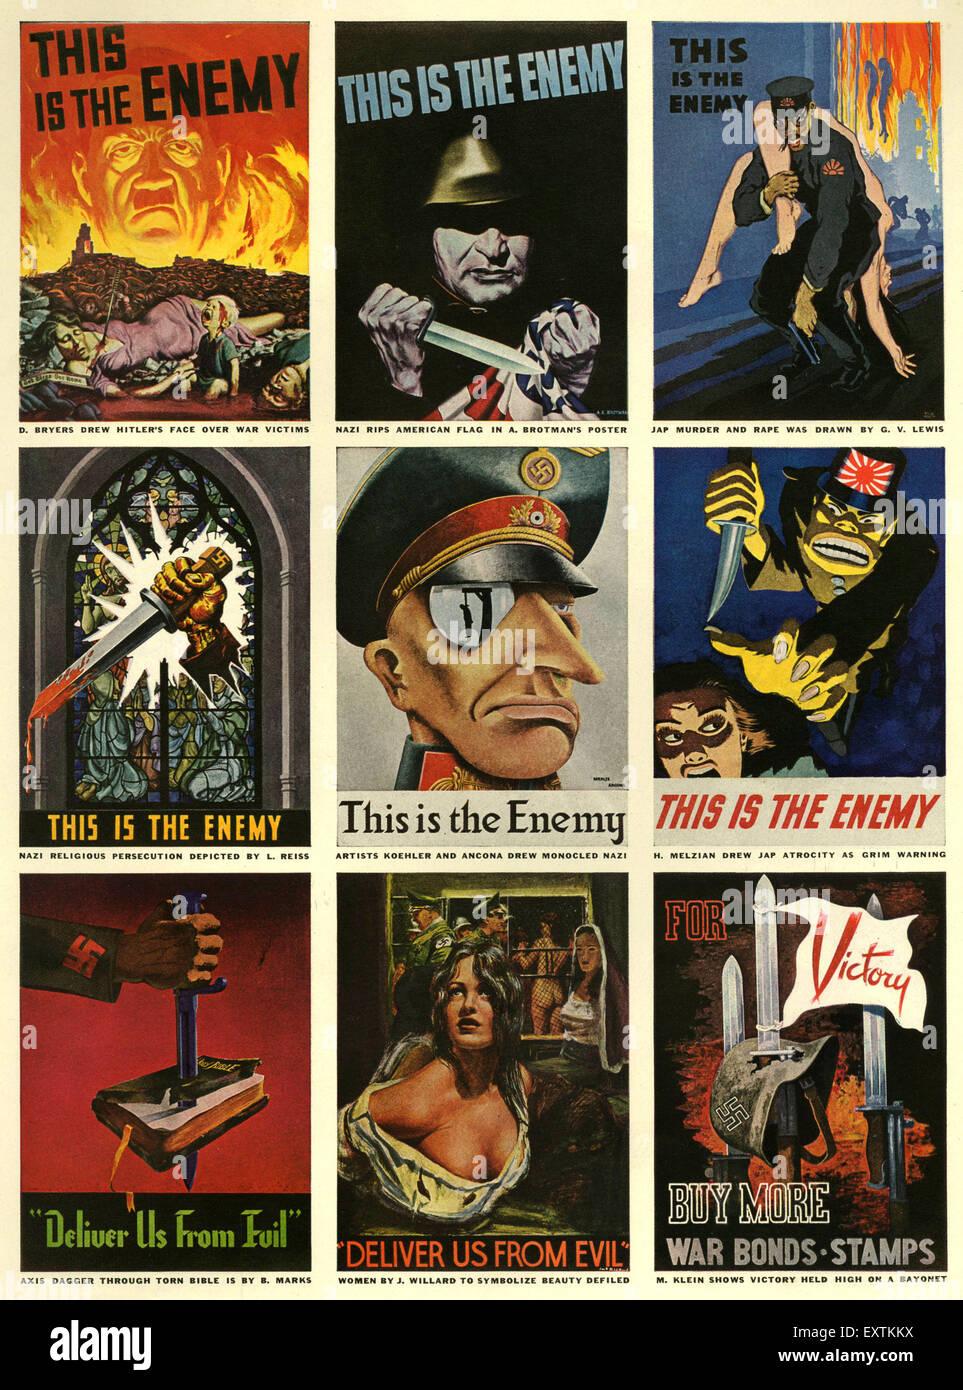 1940s UK World War Two Magazine Plate - Stock Image